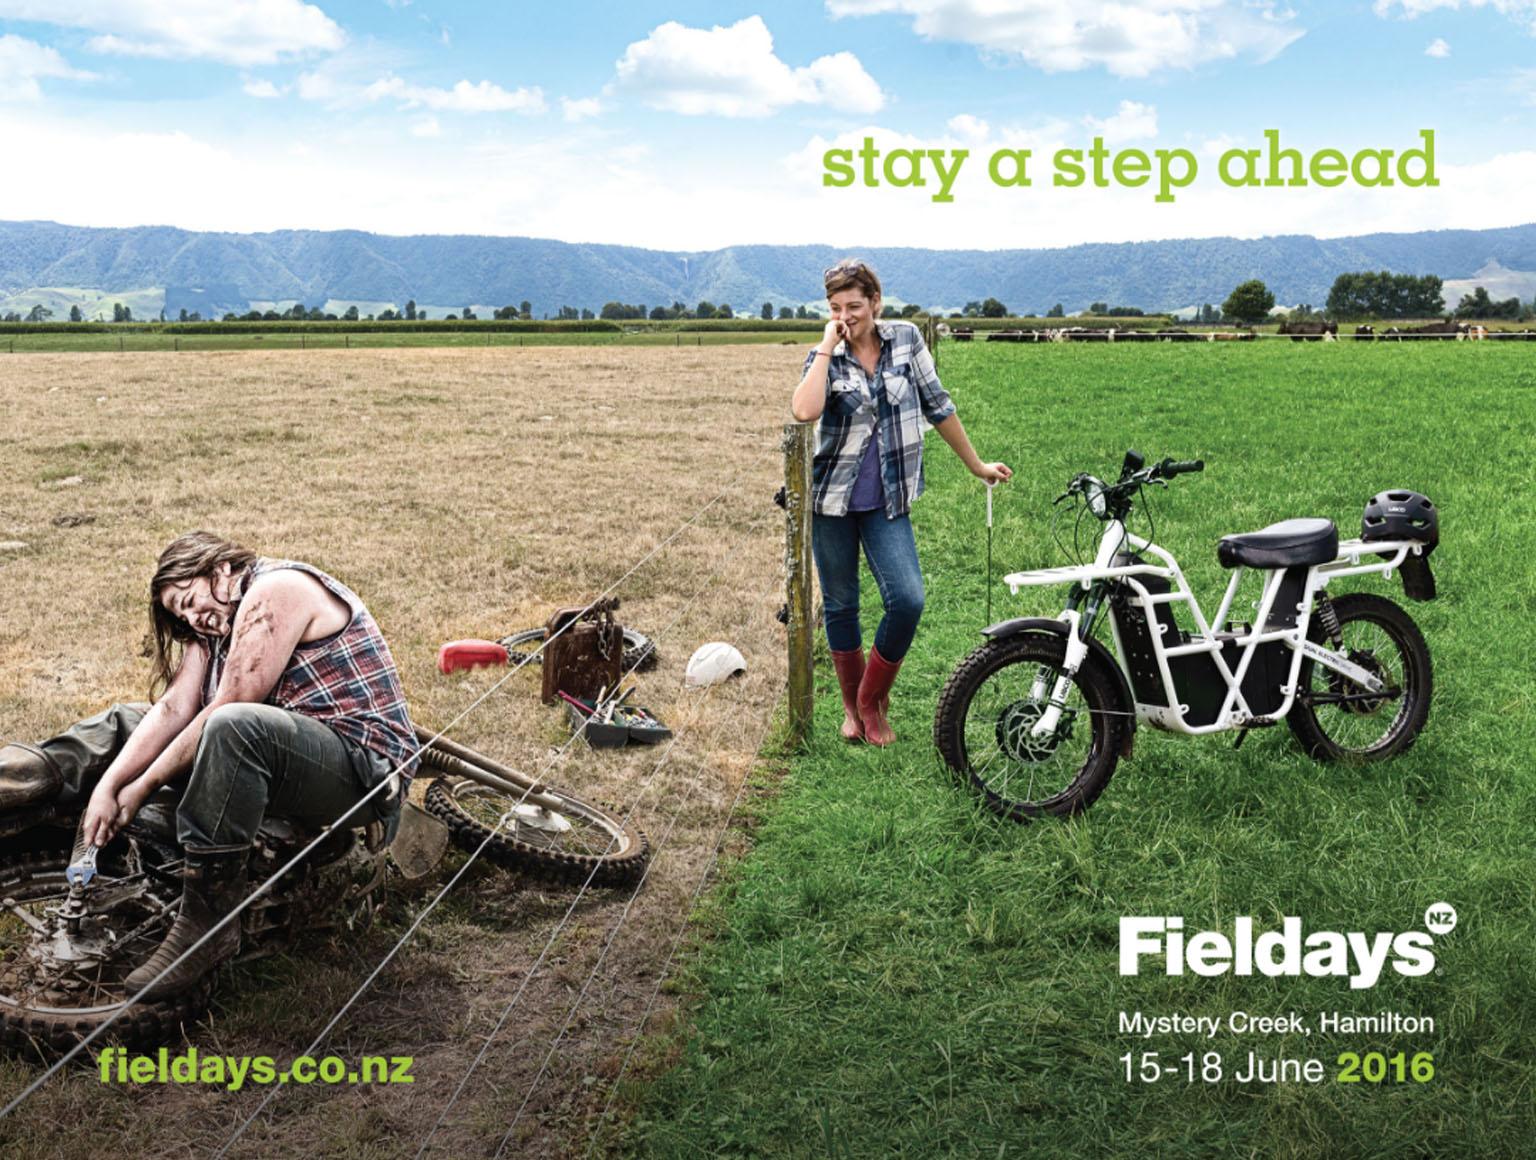 fieldays_ad